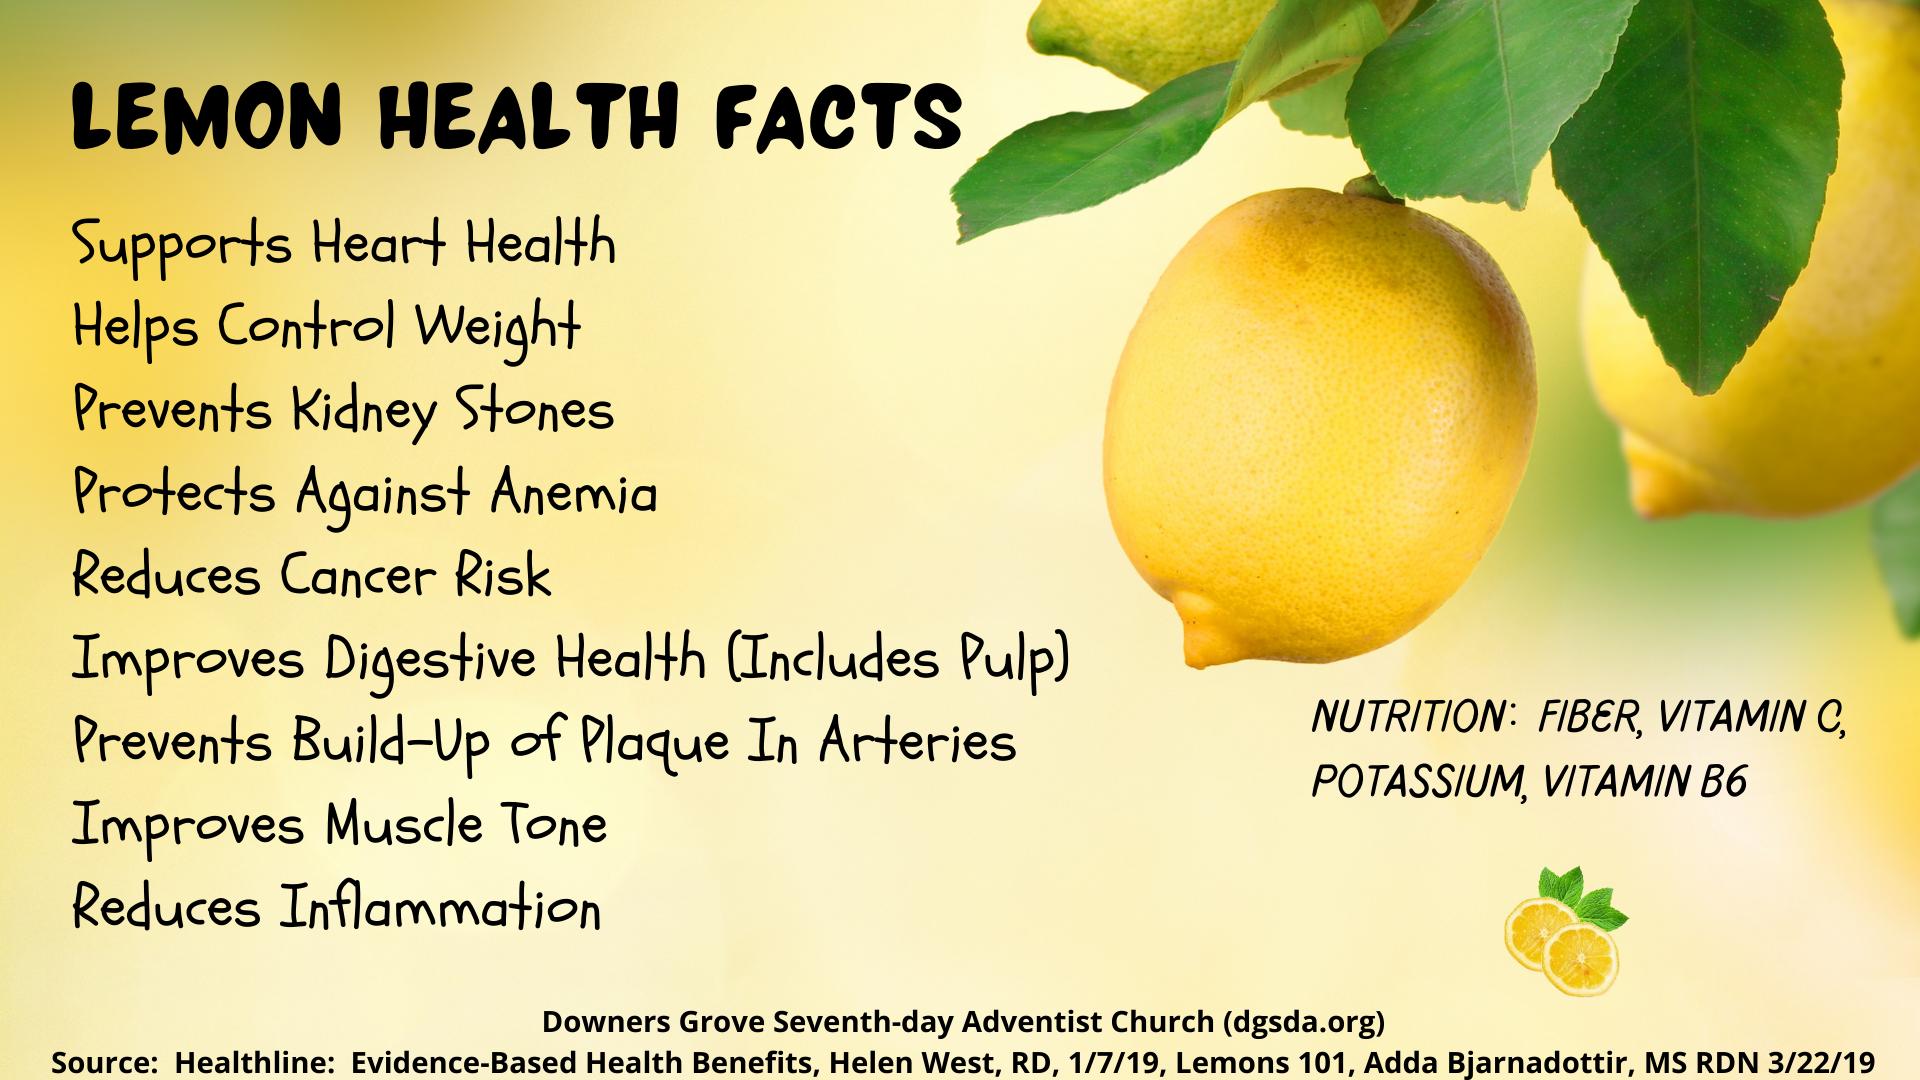 Lemon Health Facts